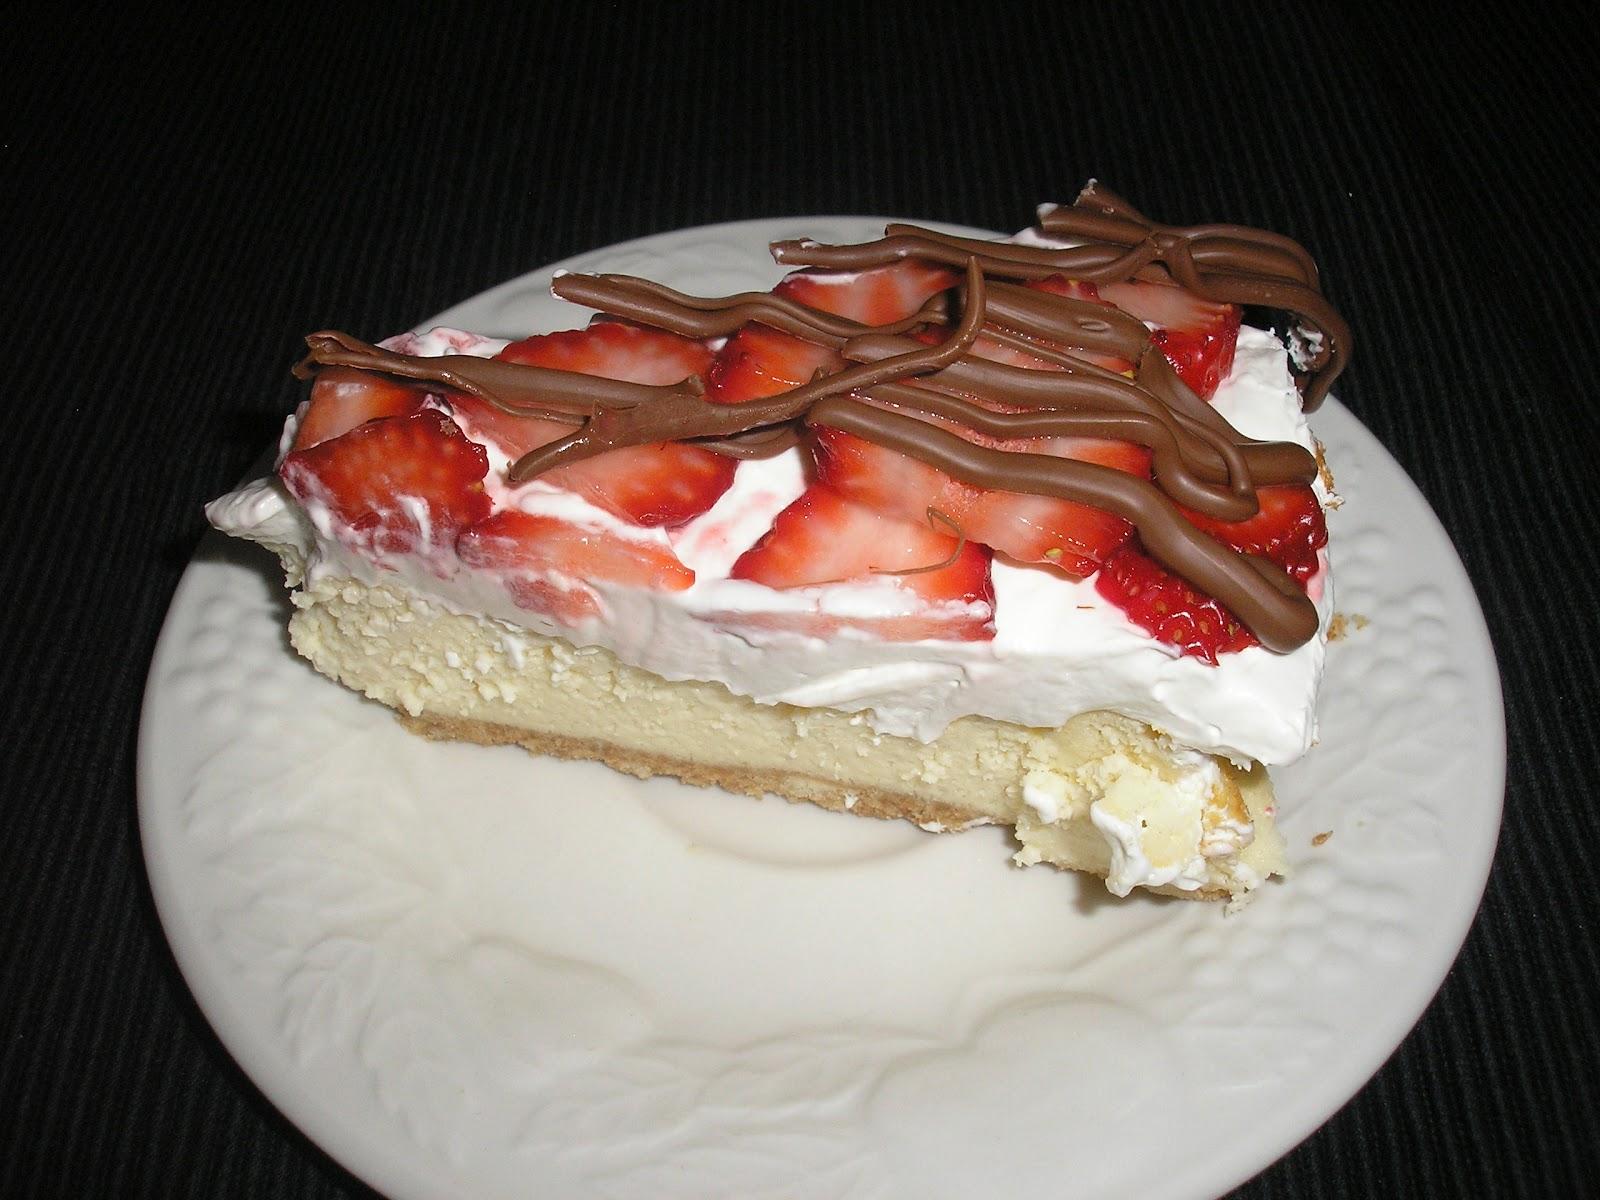 Cookin' Mamas: Chocolate Covered Strawberry Cheesecake